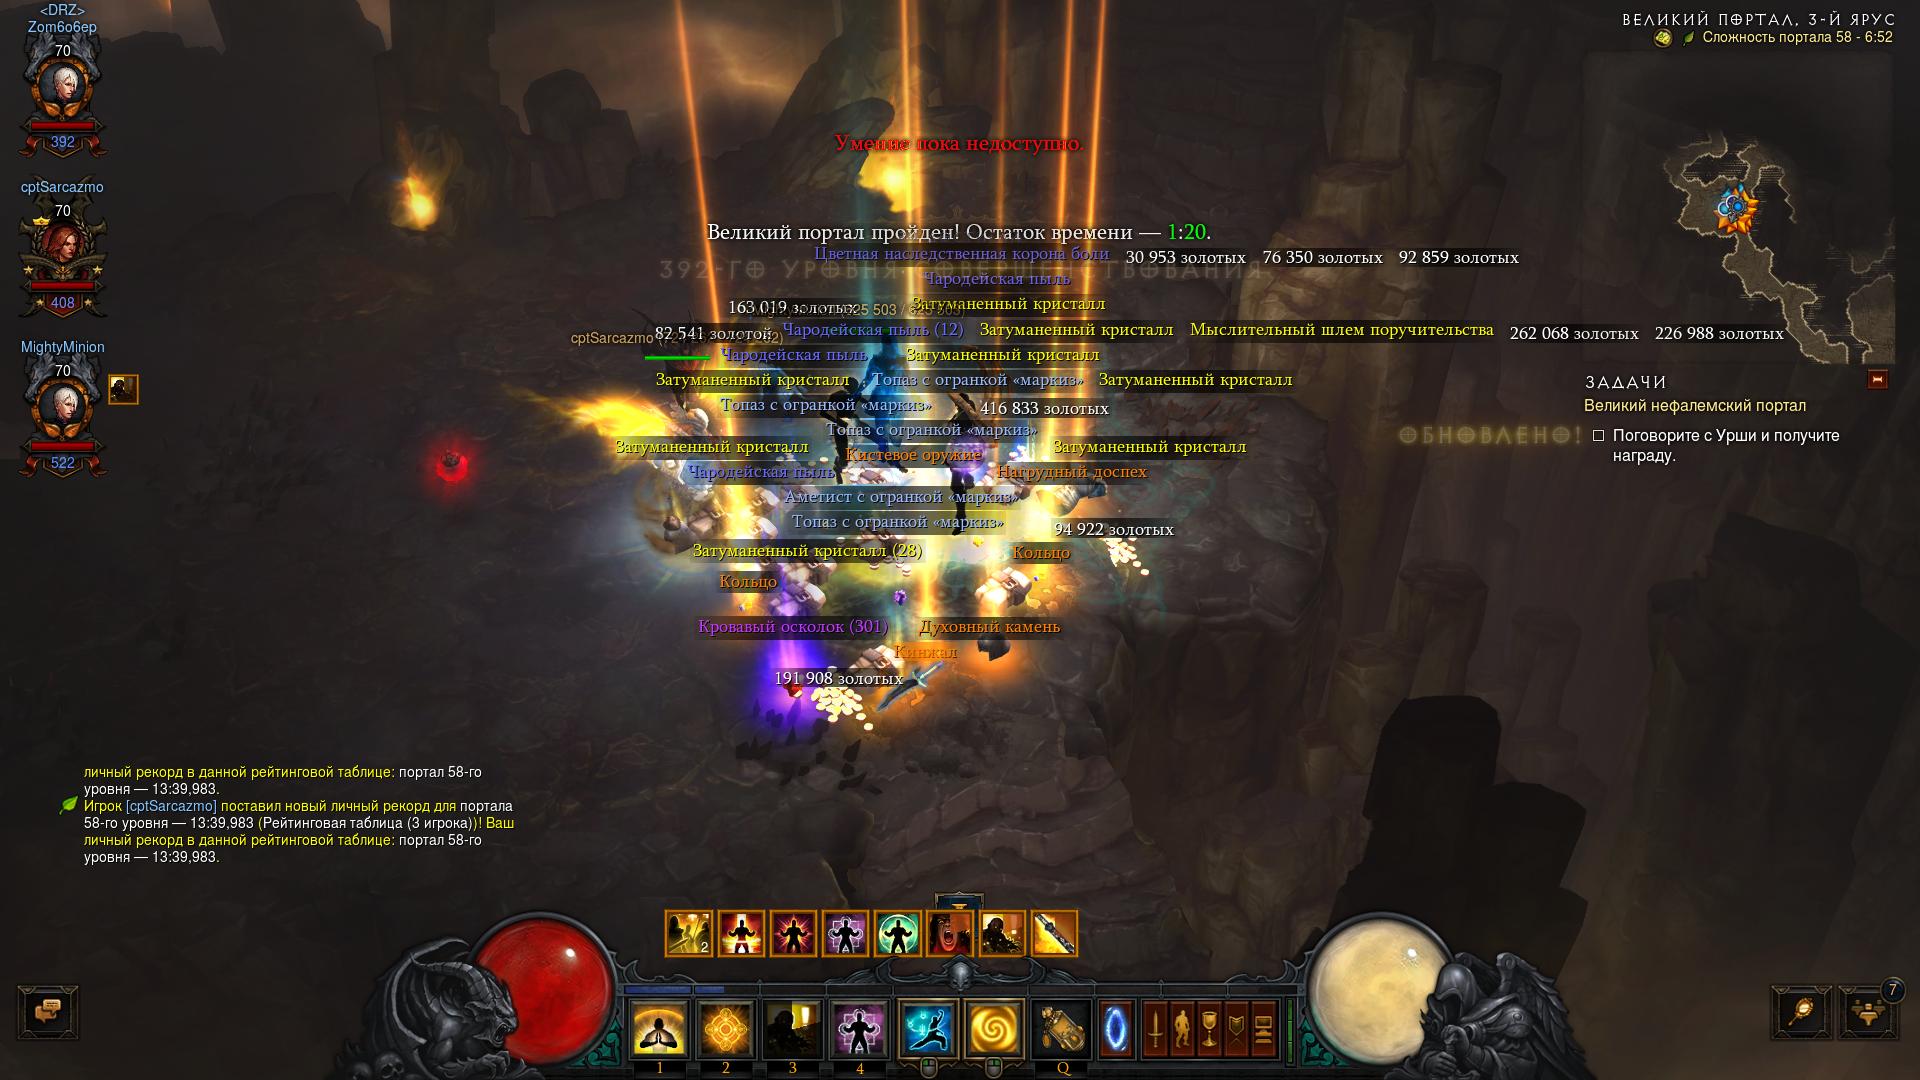 Diablo 3. Вкратце о патче 2.3.0 и о четвертом сезоне - Изображение 7